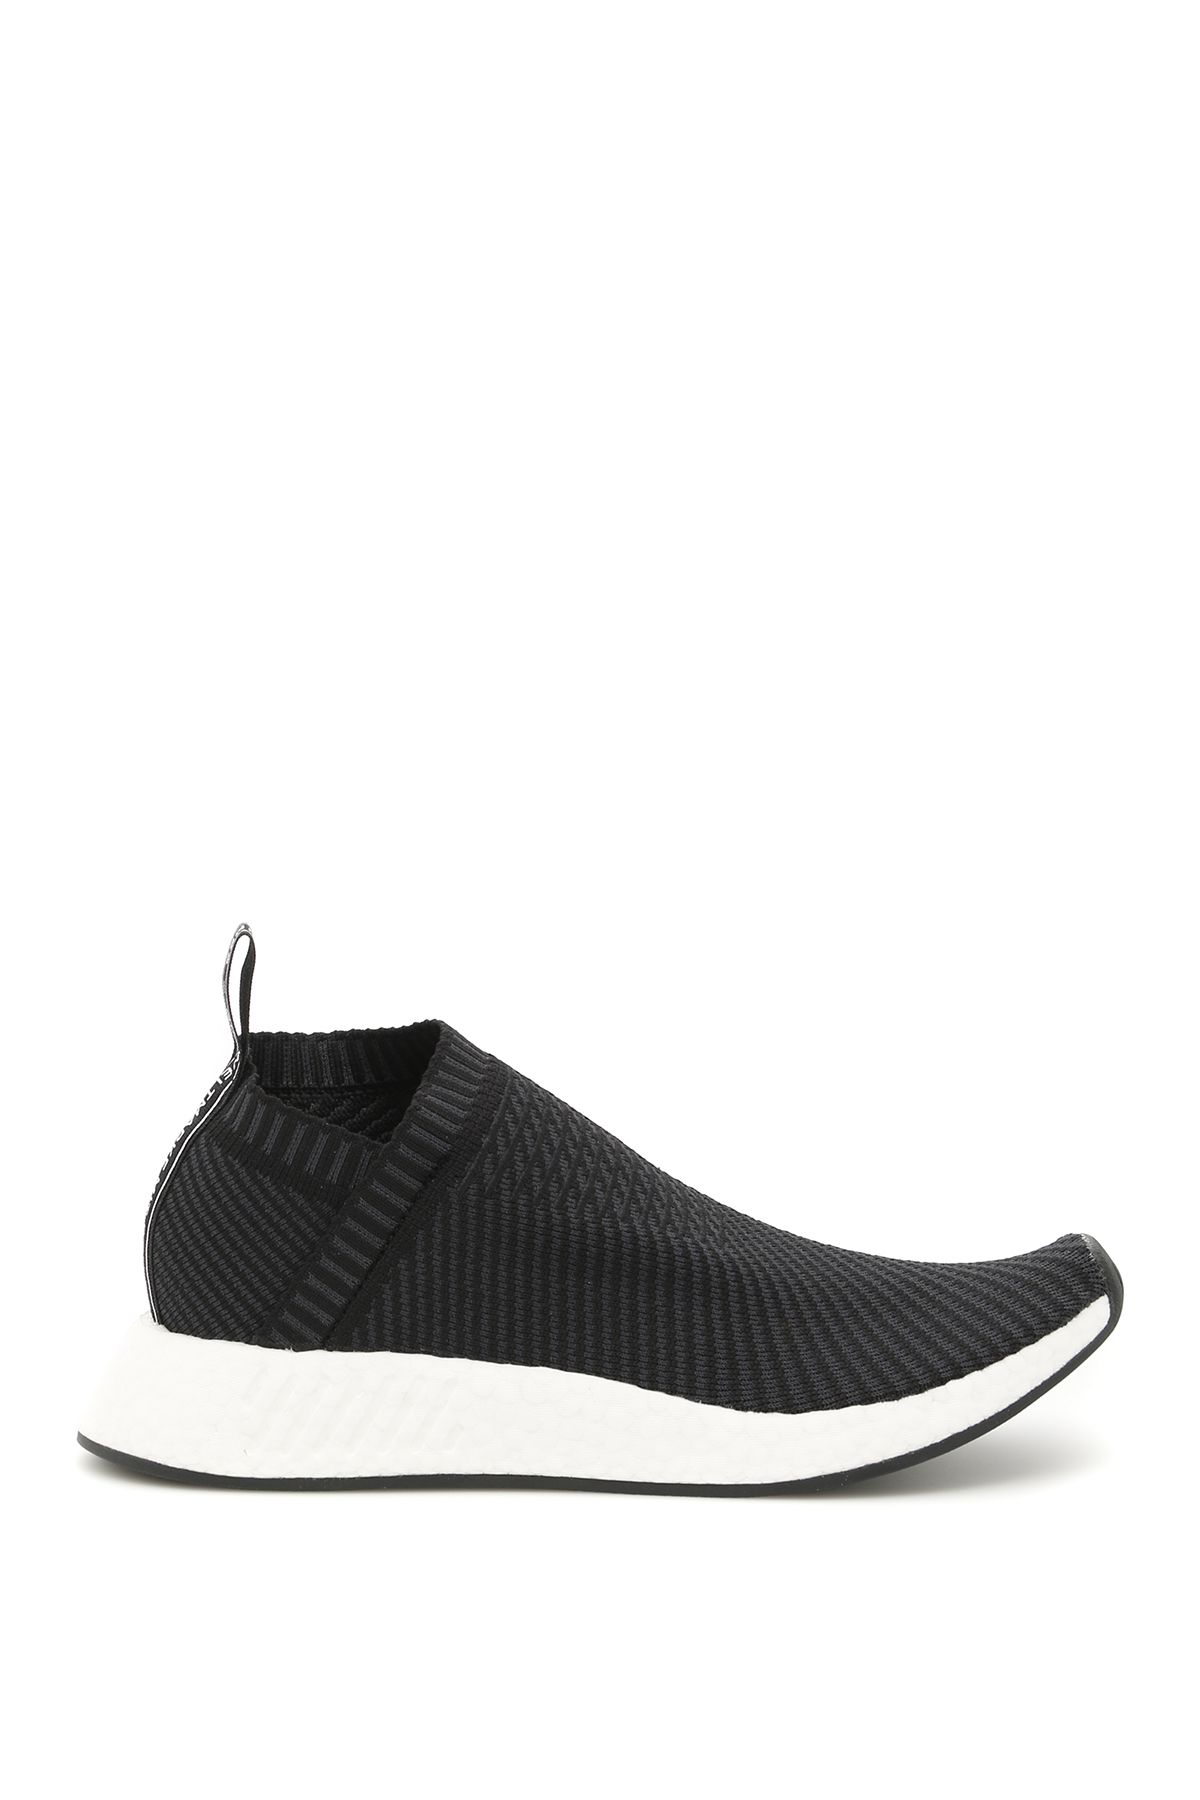 2159742631b1f ADIDAS ORIGINALS NMD CS2 PK SNEAKERS.  adidasoriginals  shoes ...